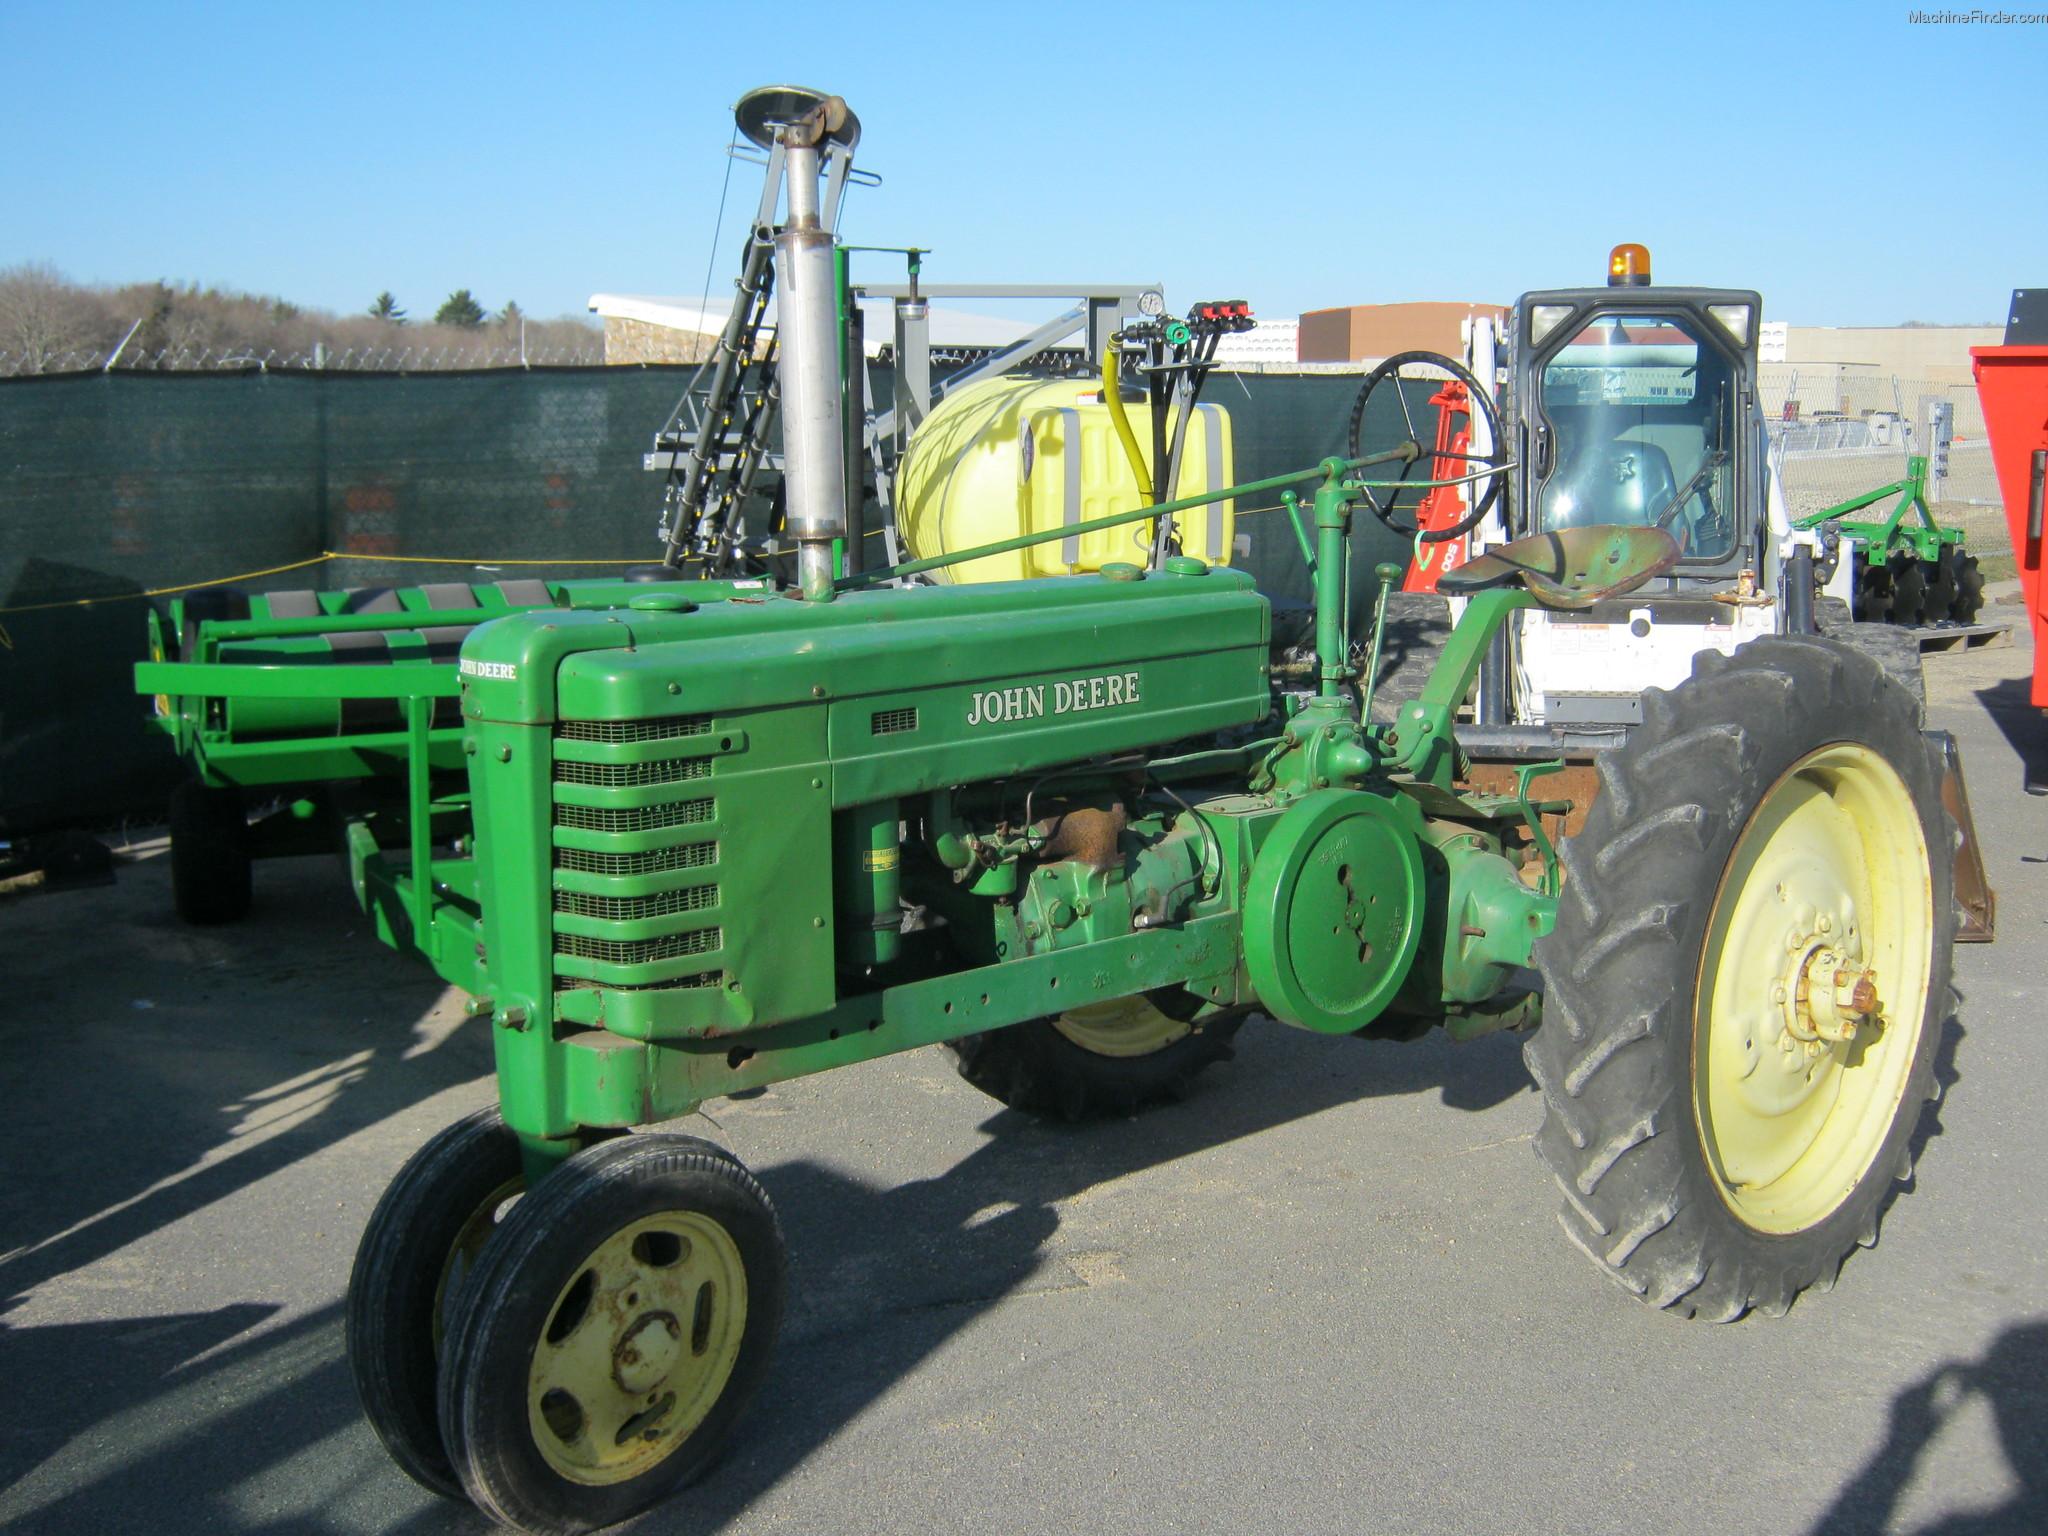 John Deere H Series Tractors - Compact (1-40hp.) - John ...